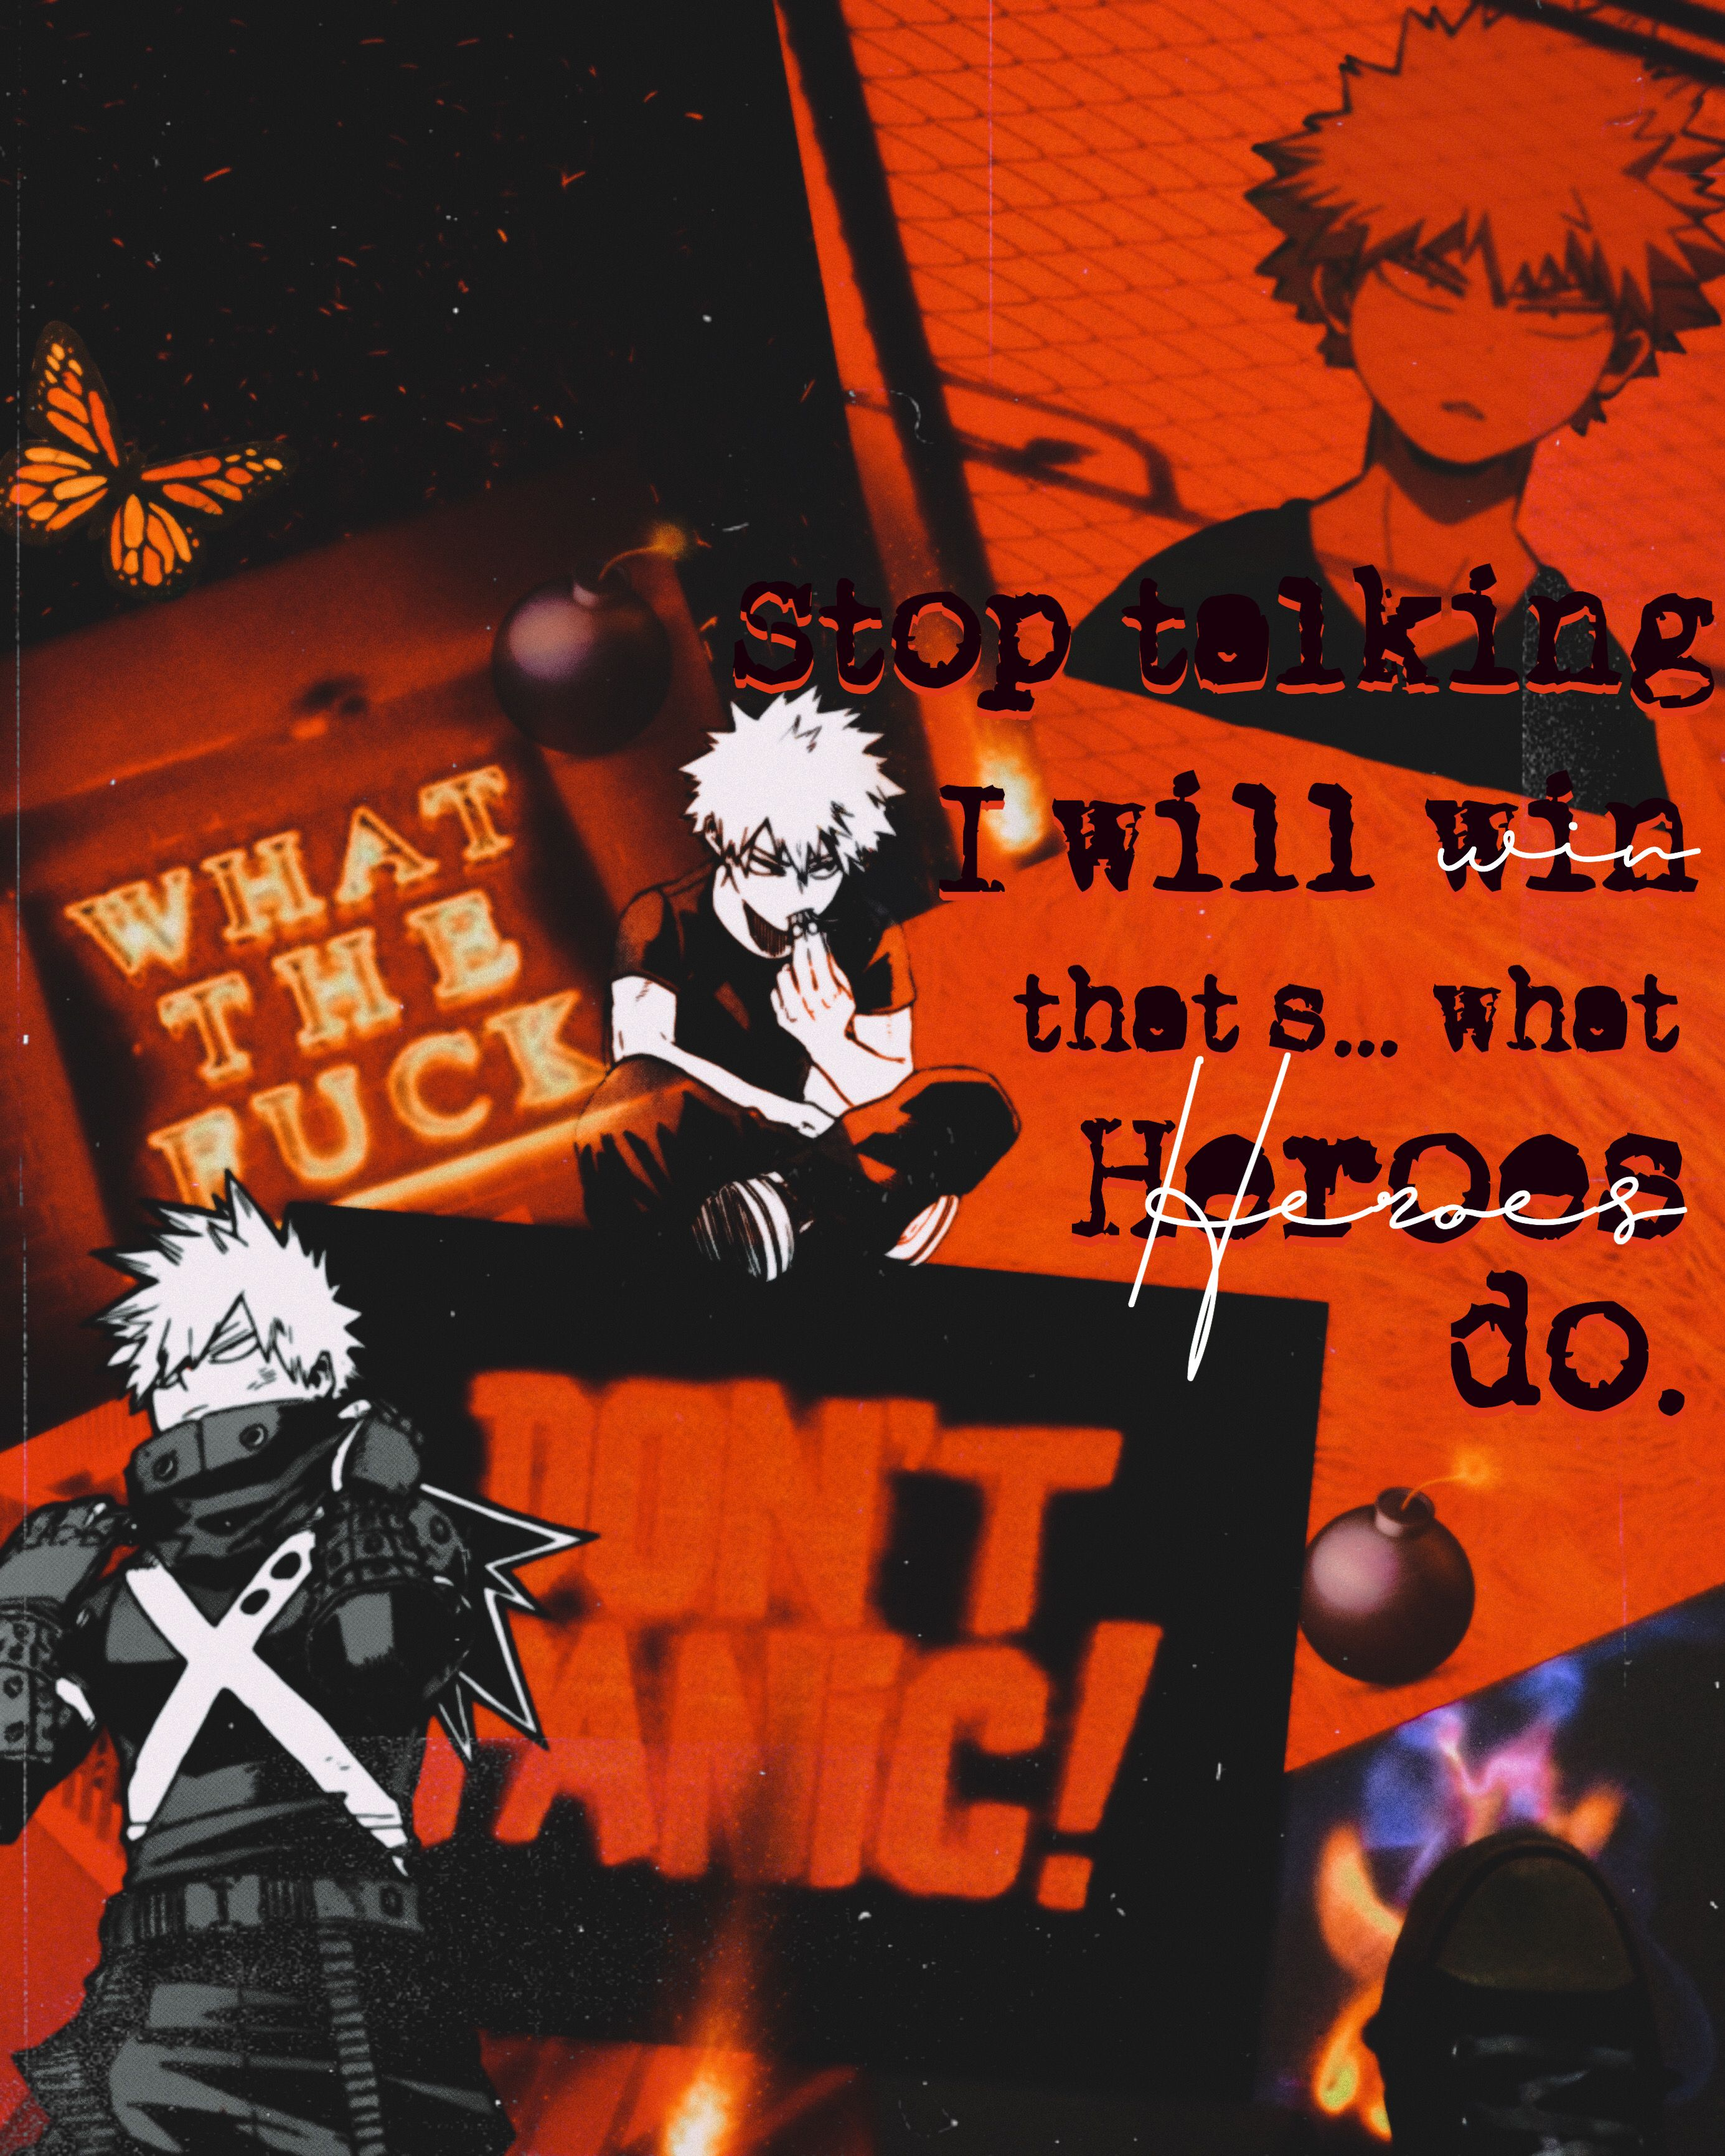 Katsuki Bakugo Orange Aesthetic Anime Wallpaper Something To Do